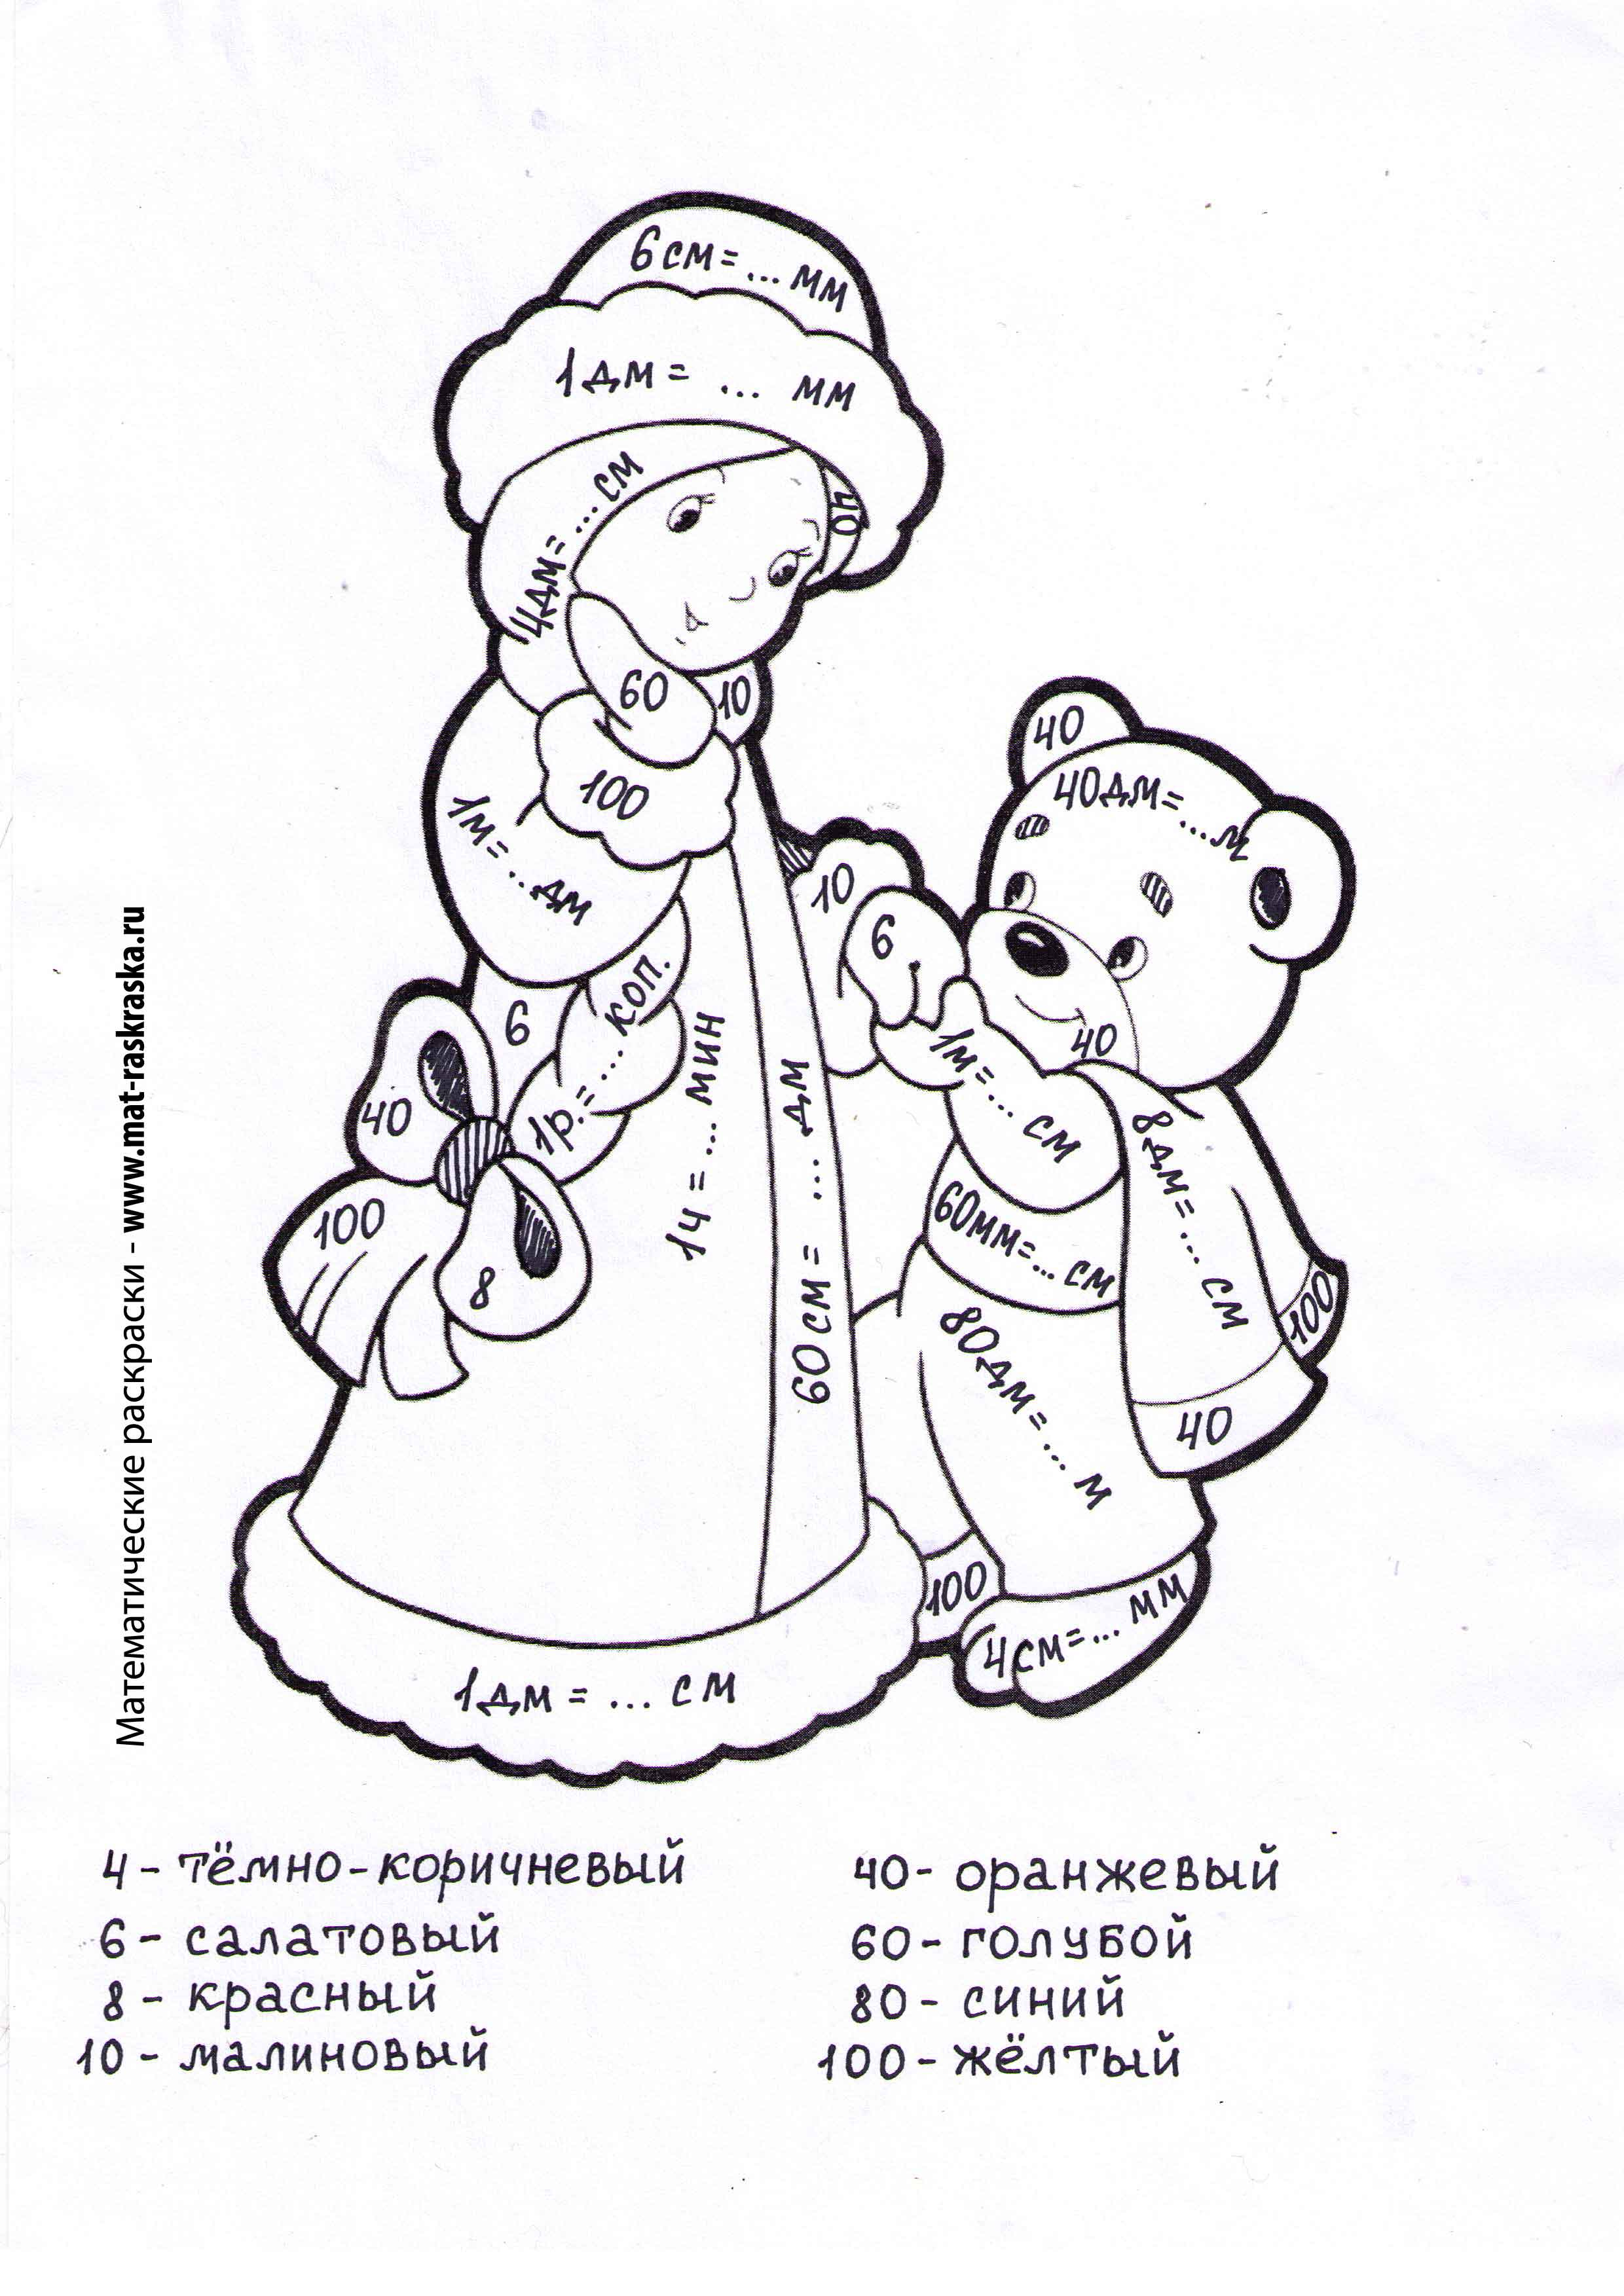 http://www.mat-raskraska.ru/images/stories/Raskraski/Deistvia-s-velichinami/snegurochka-i-medvrzonok-edinitsi-dlini-vremeni-stoimosti_big.jpg